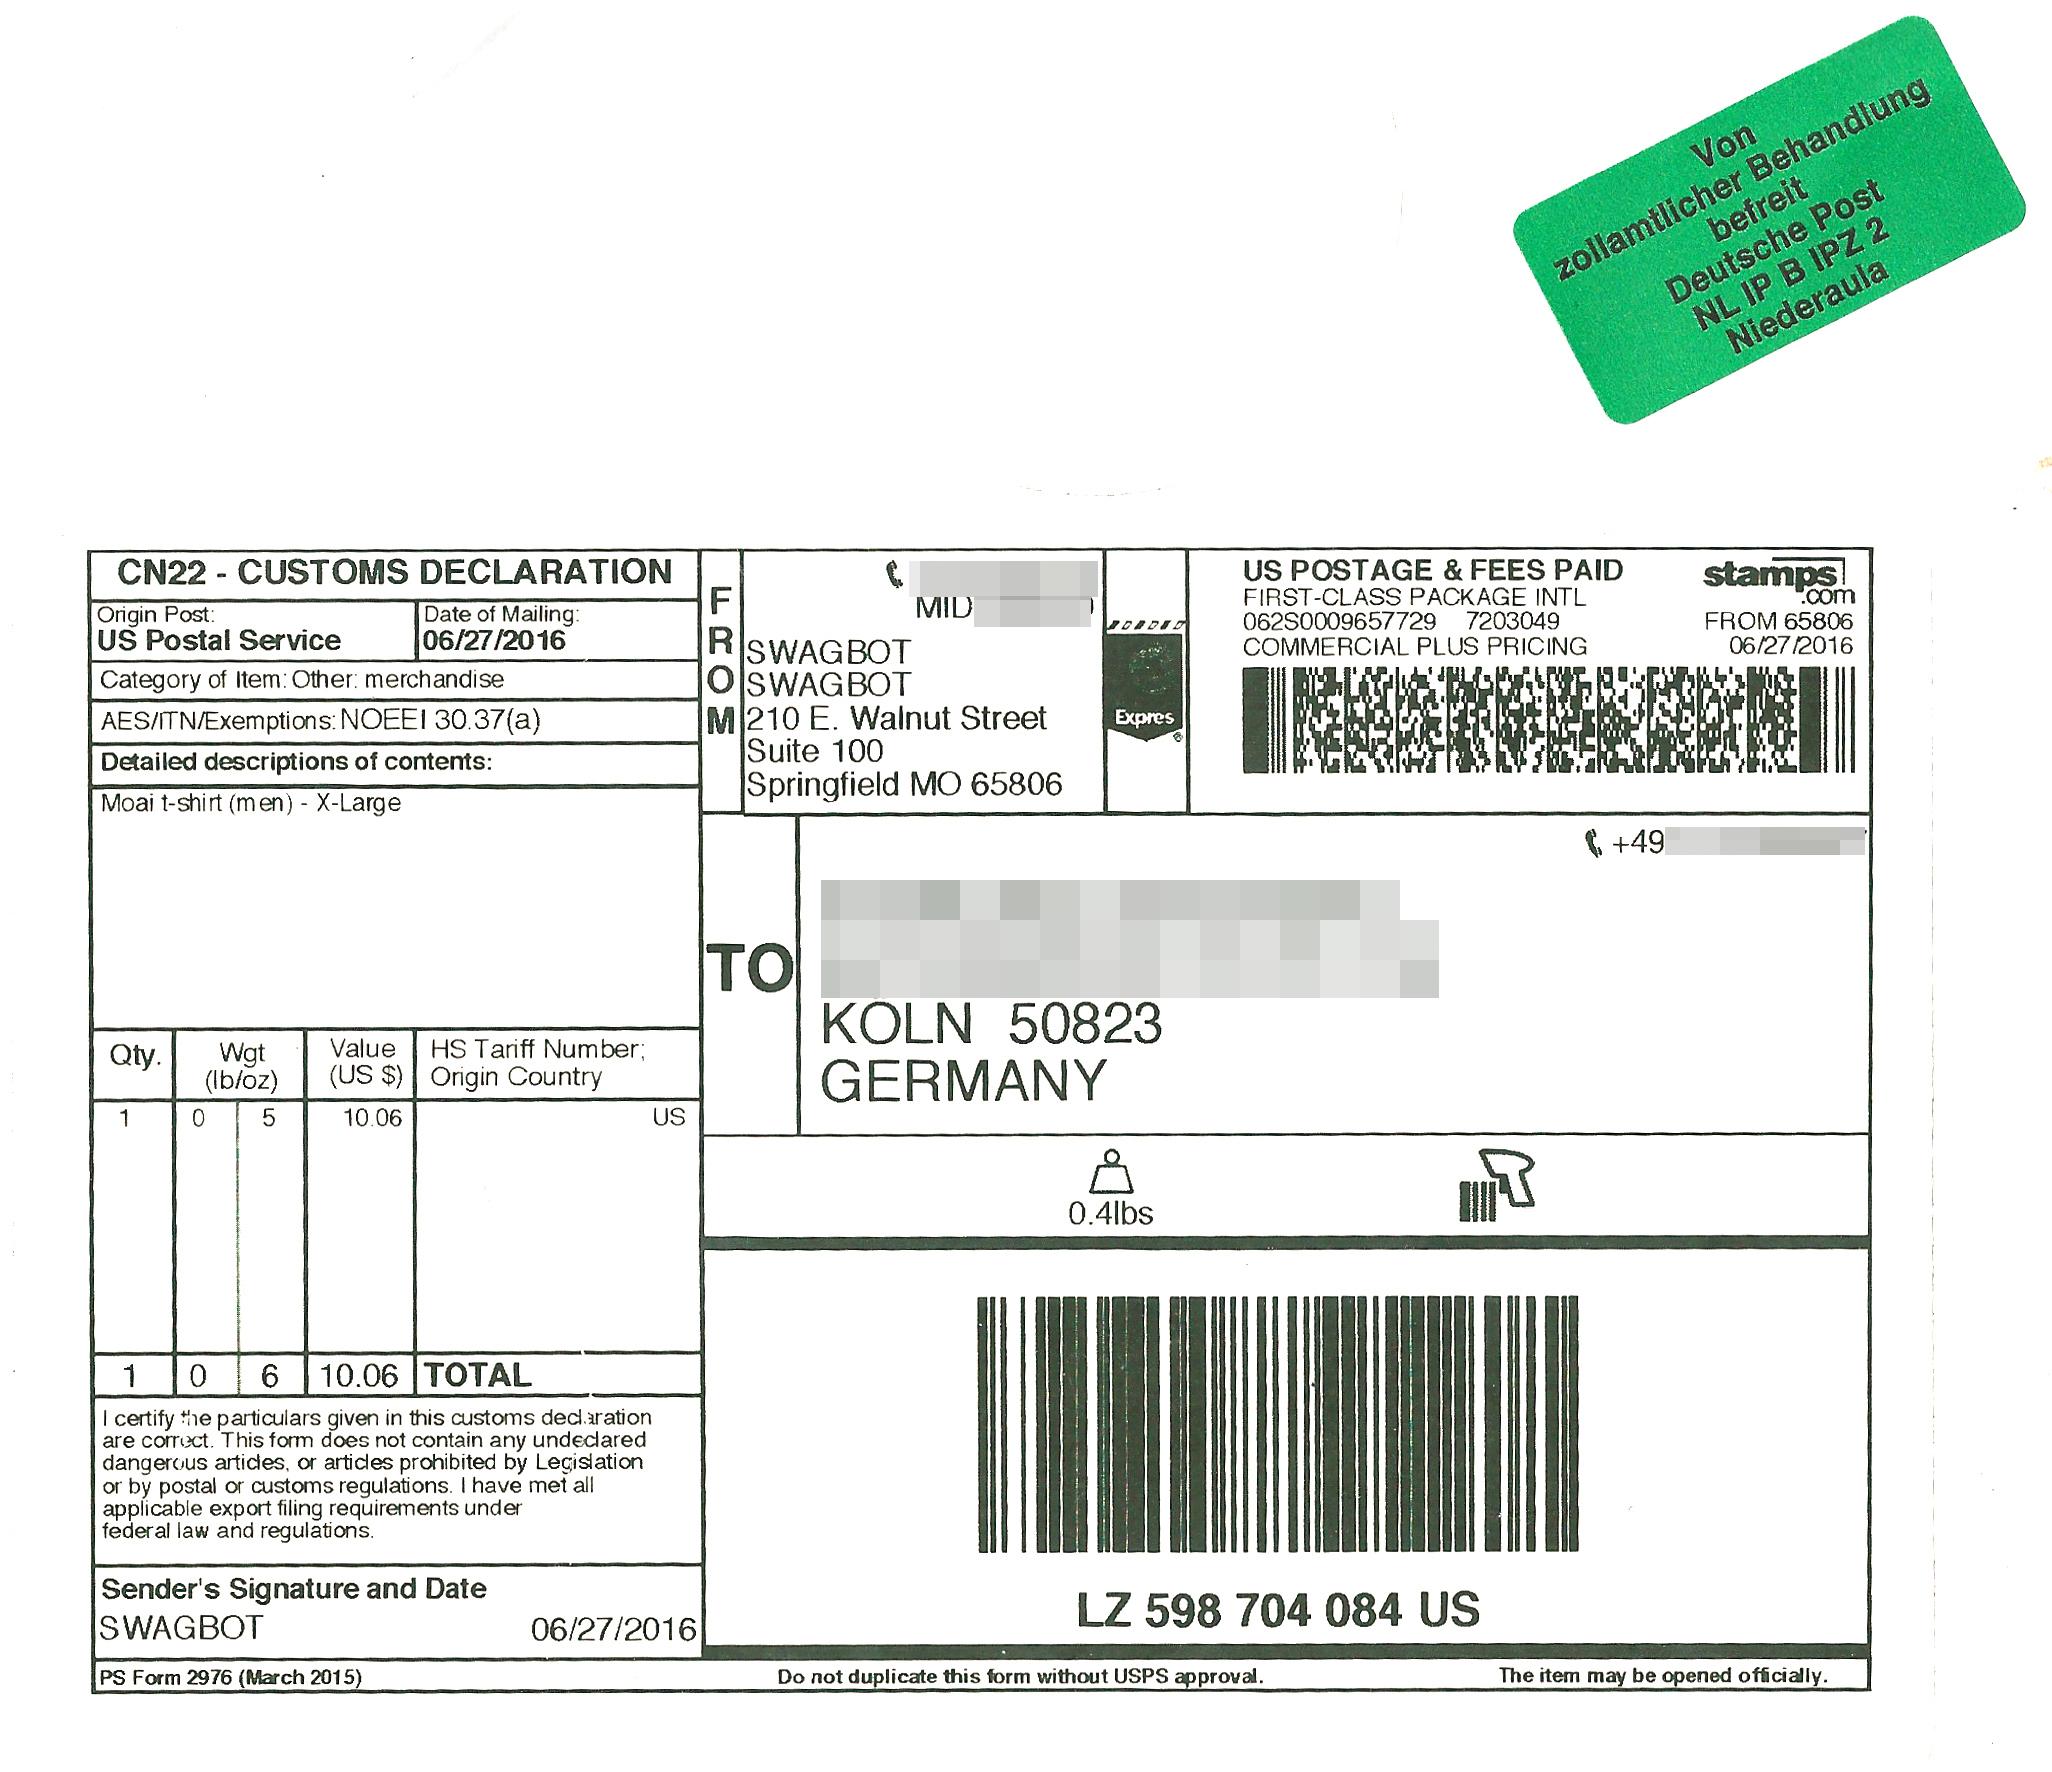 File:USPS First Class Pkg Intl USA-D With Customs